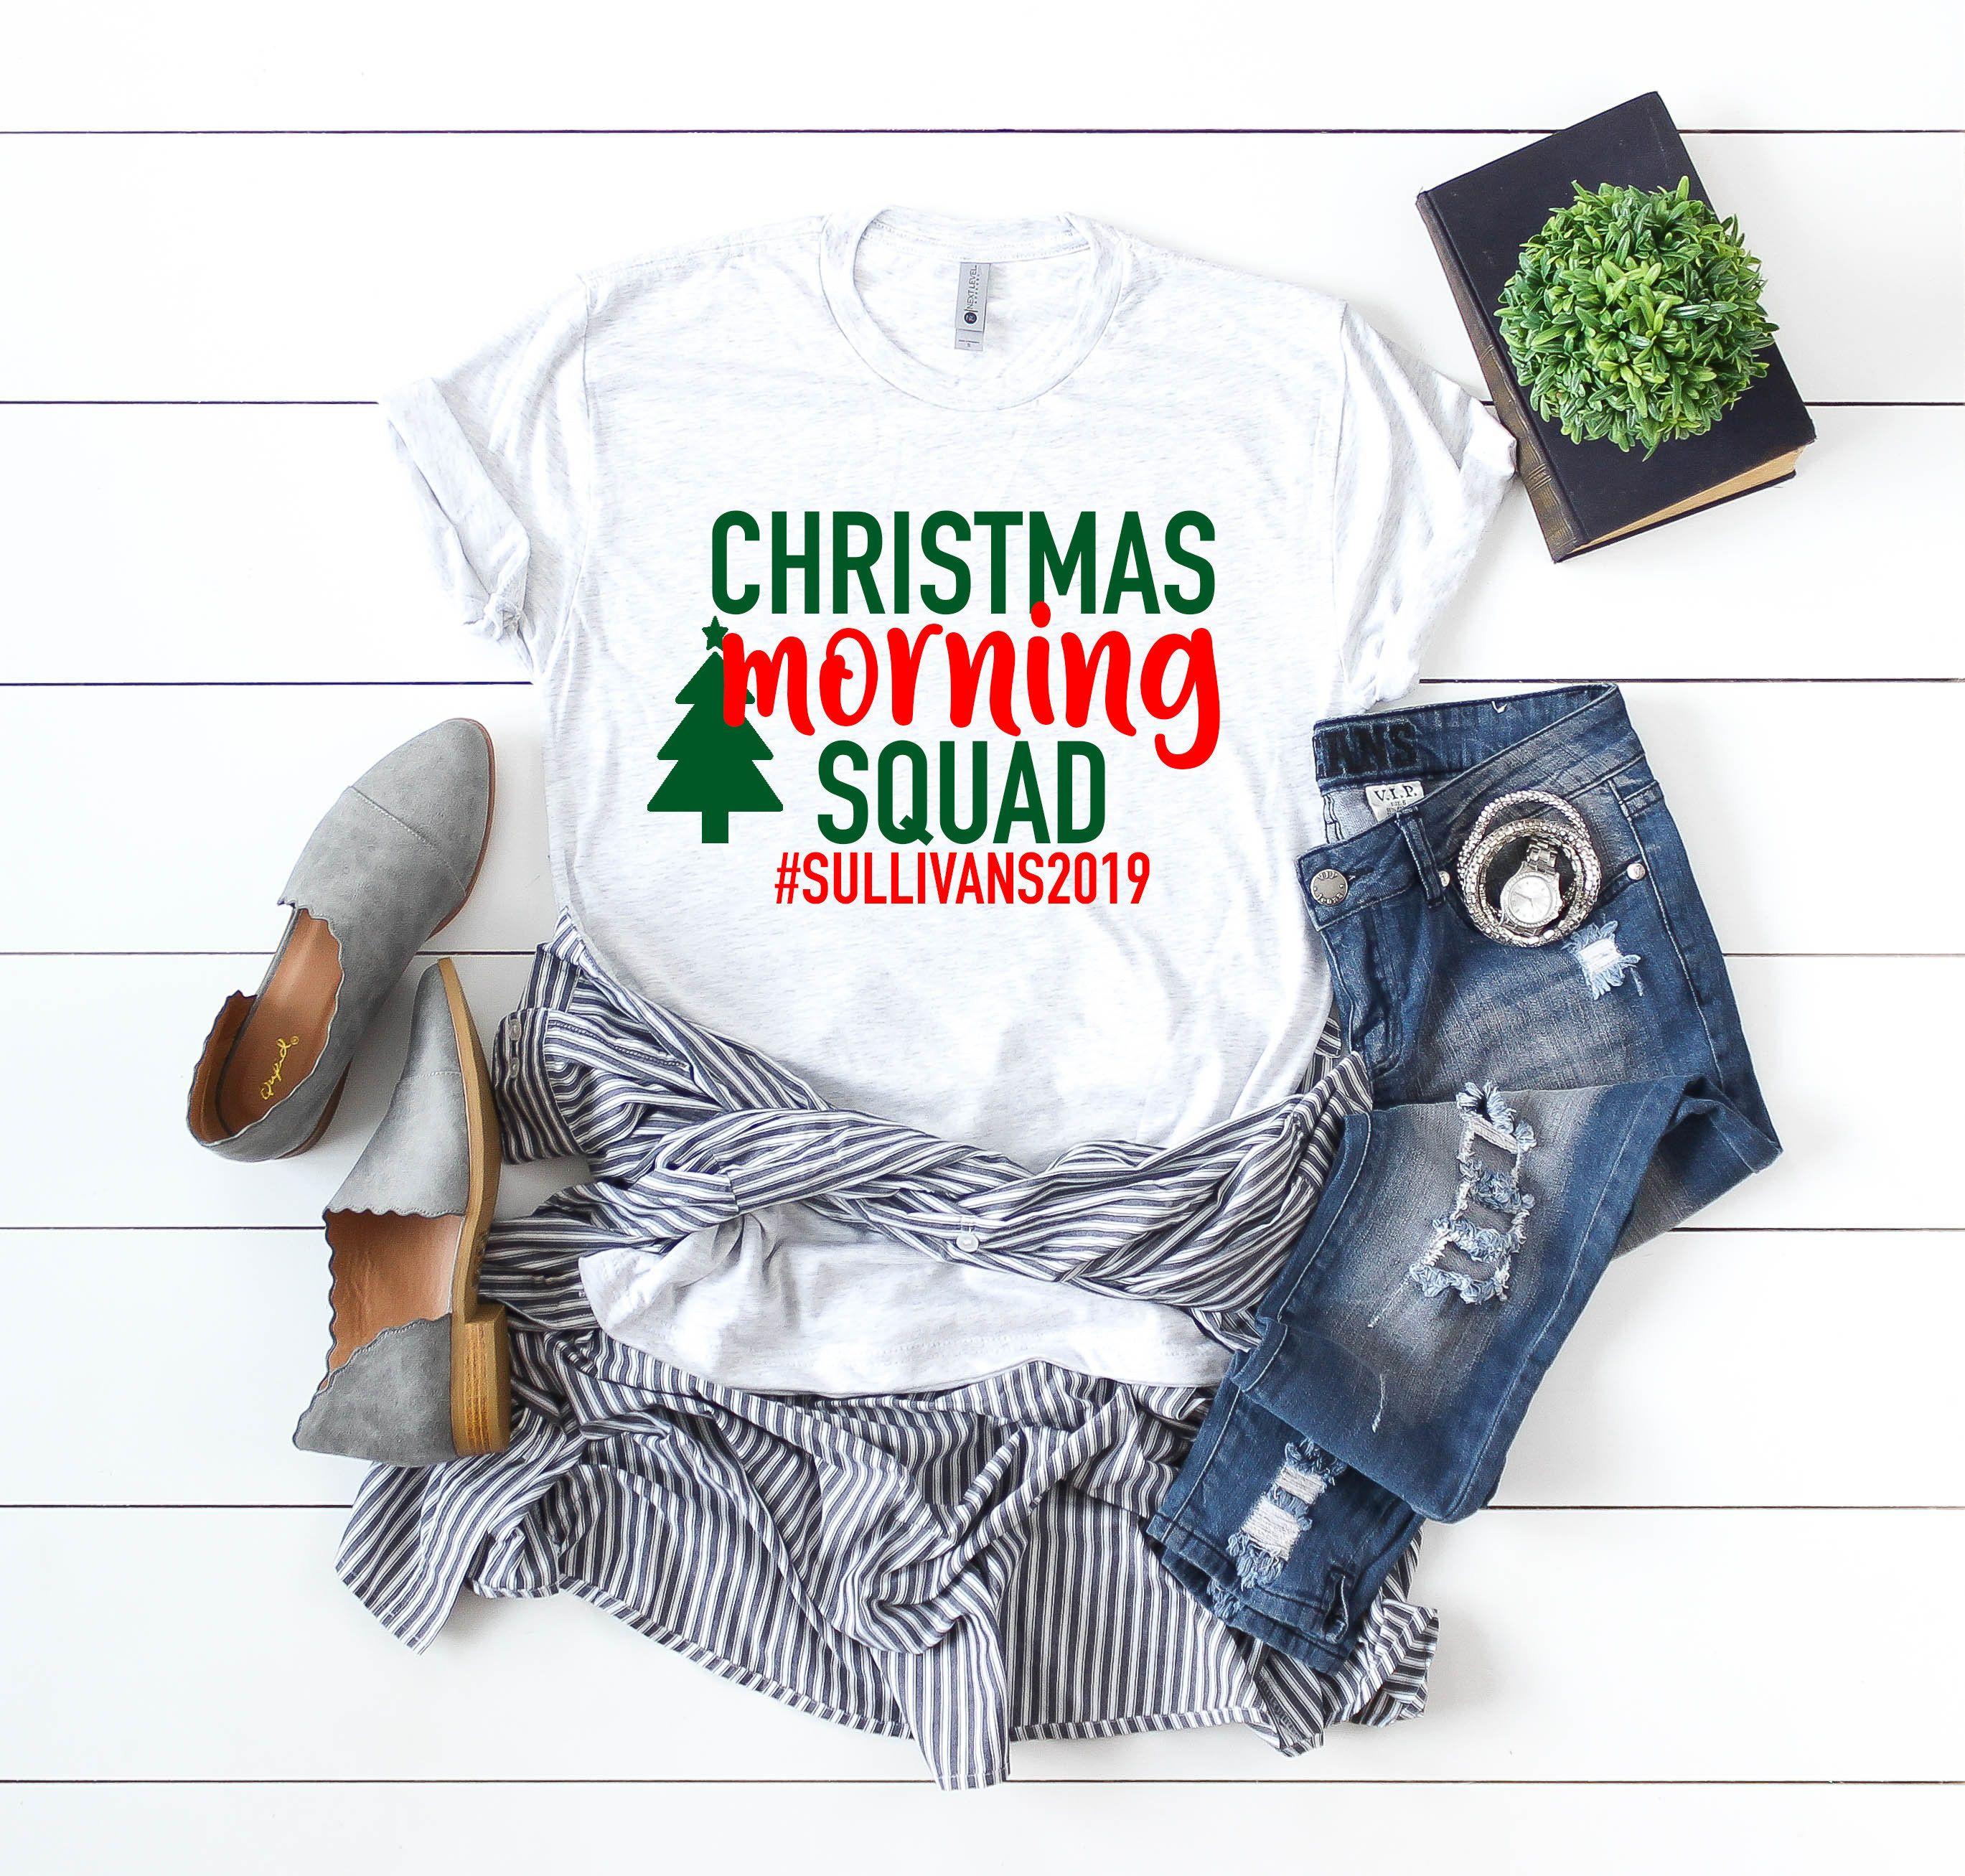 Christmas Morning Squad Customized T Shirt Cute Christmas Gift Womens Holiday Clothing Chris Womens Easter Shirt Christmas Morning Outfit Customise T Shirt